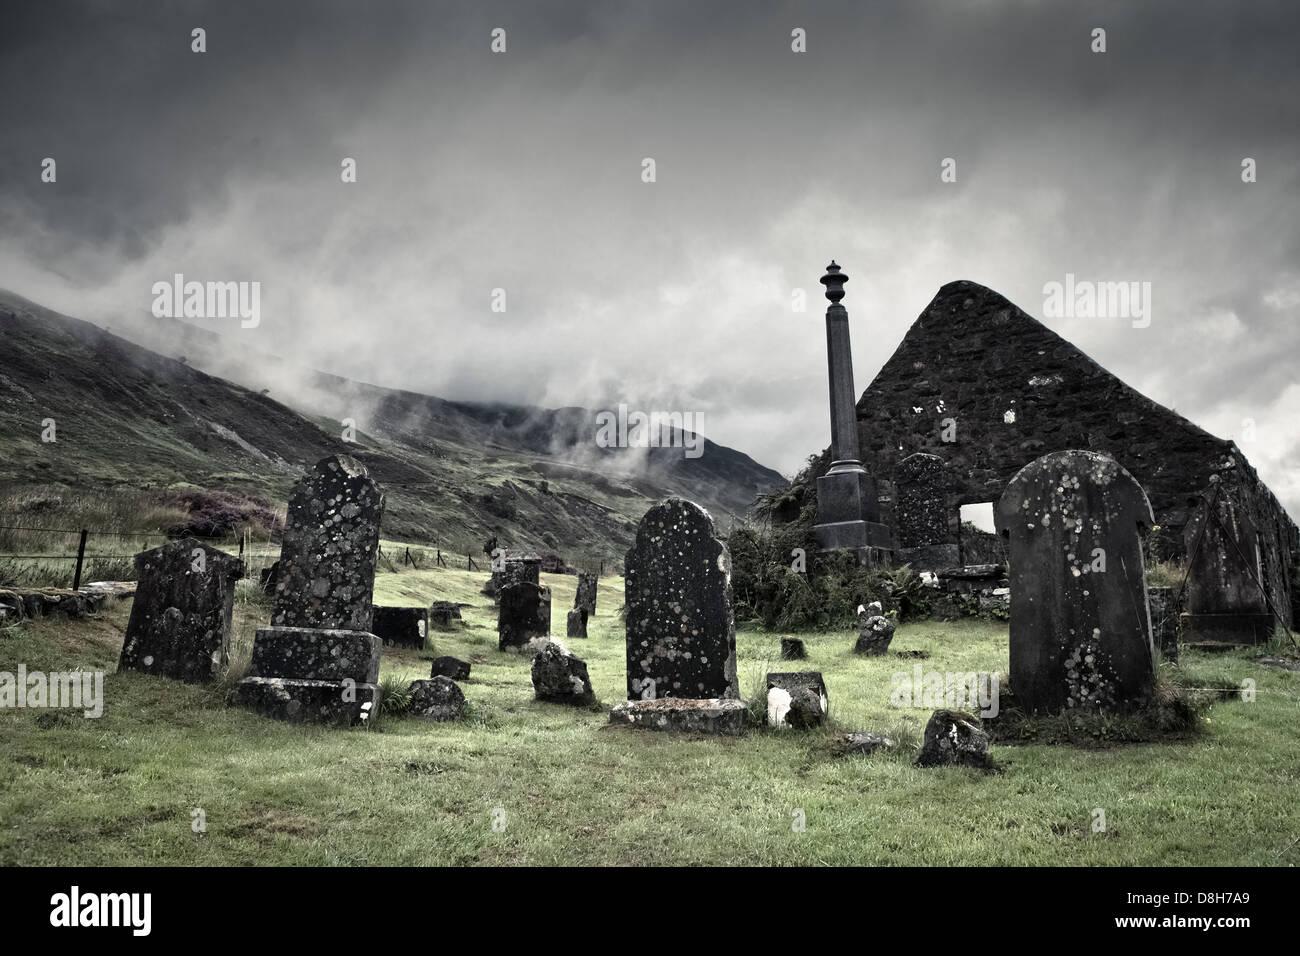 Old cemetery in the village of Dornie, Scotland - Stock Image